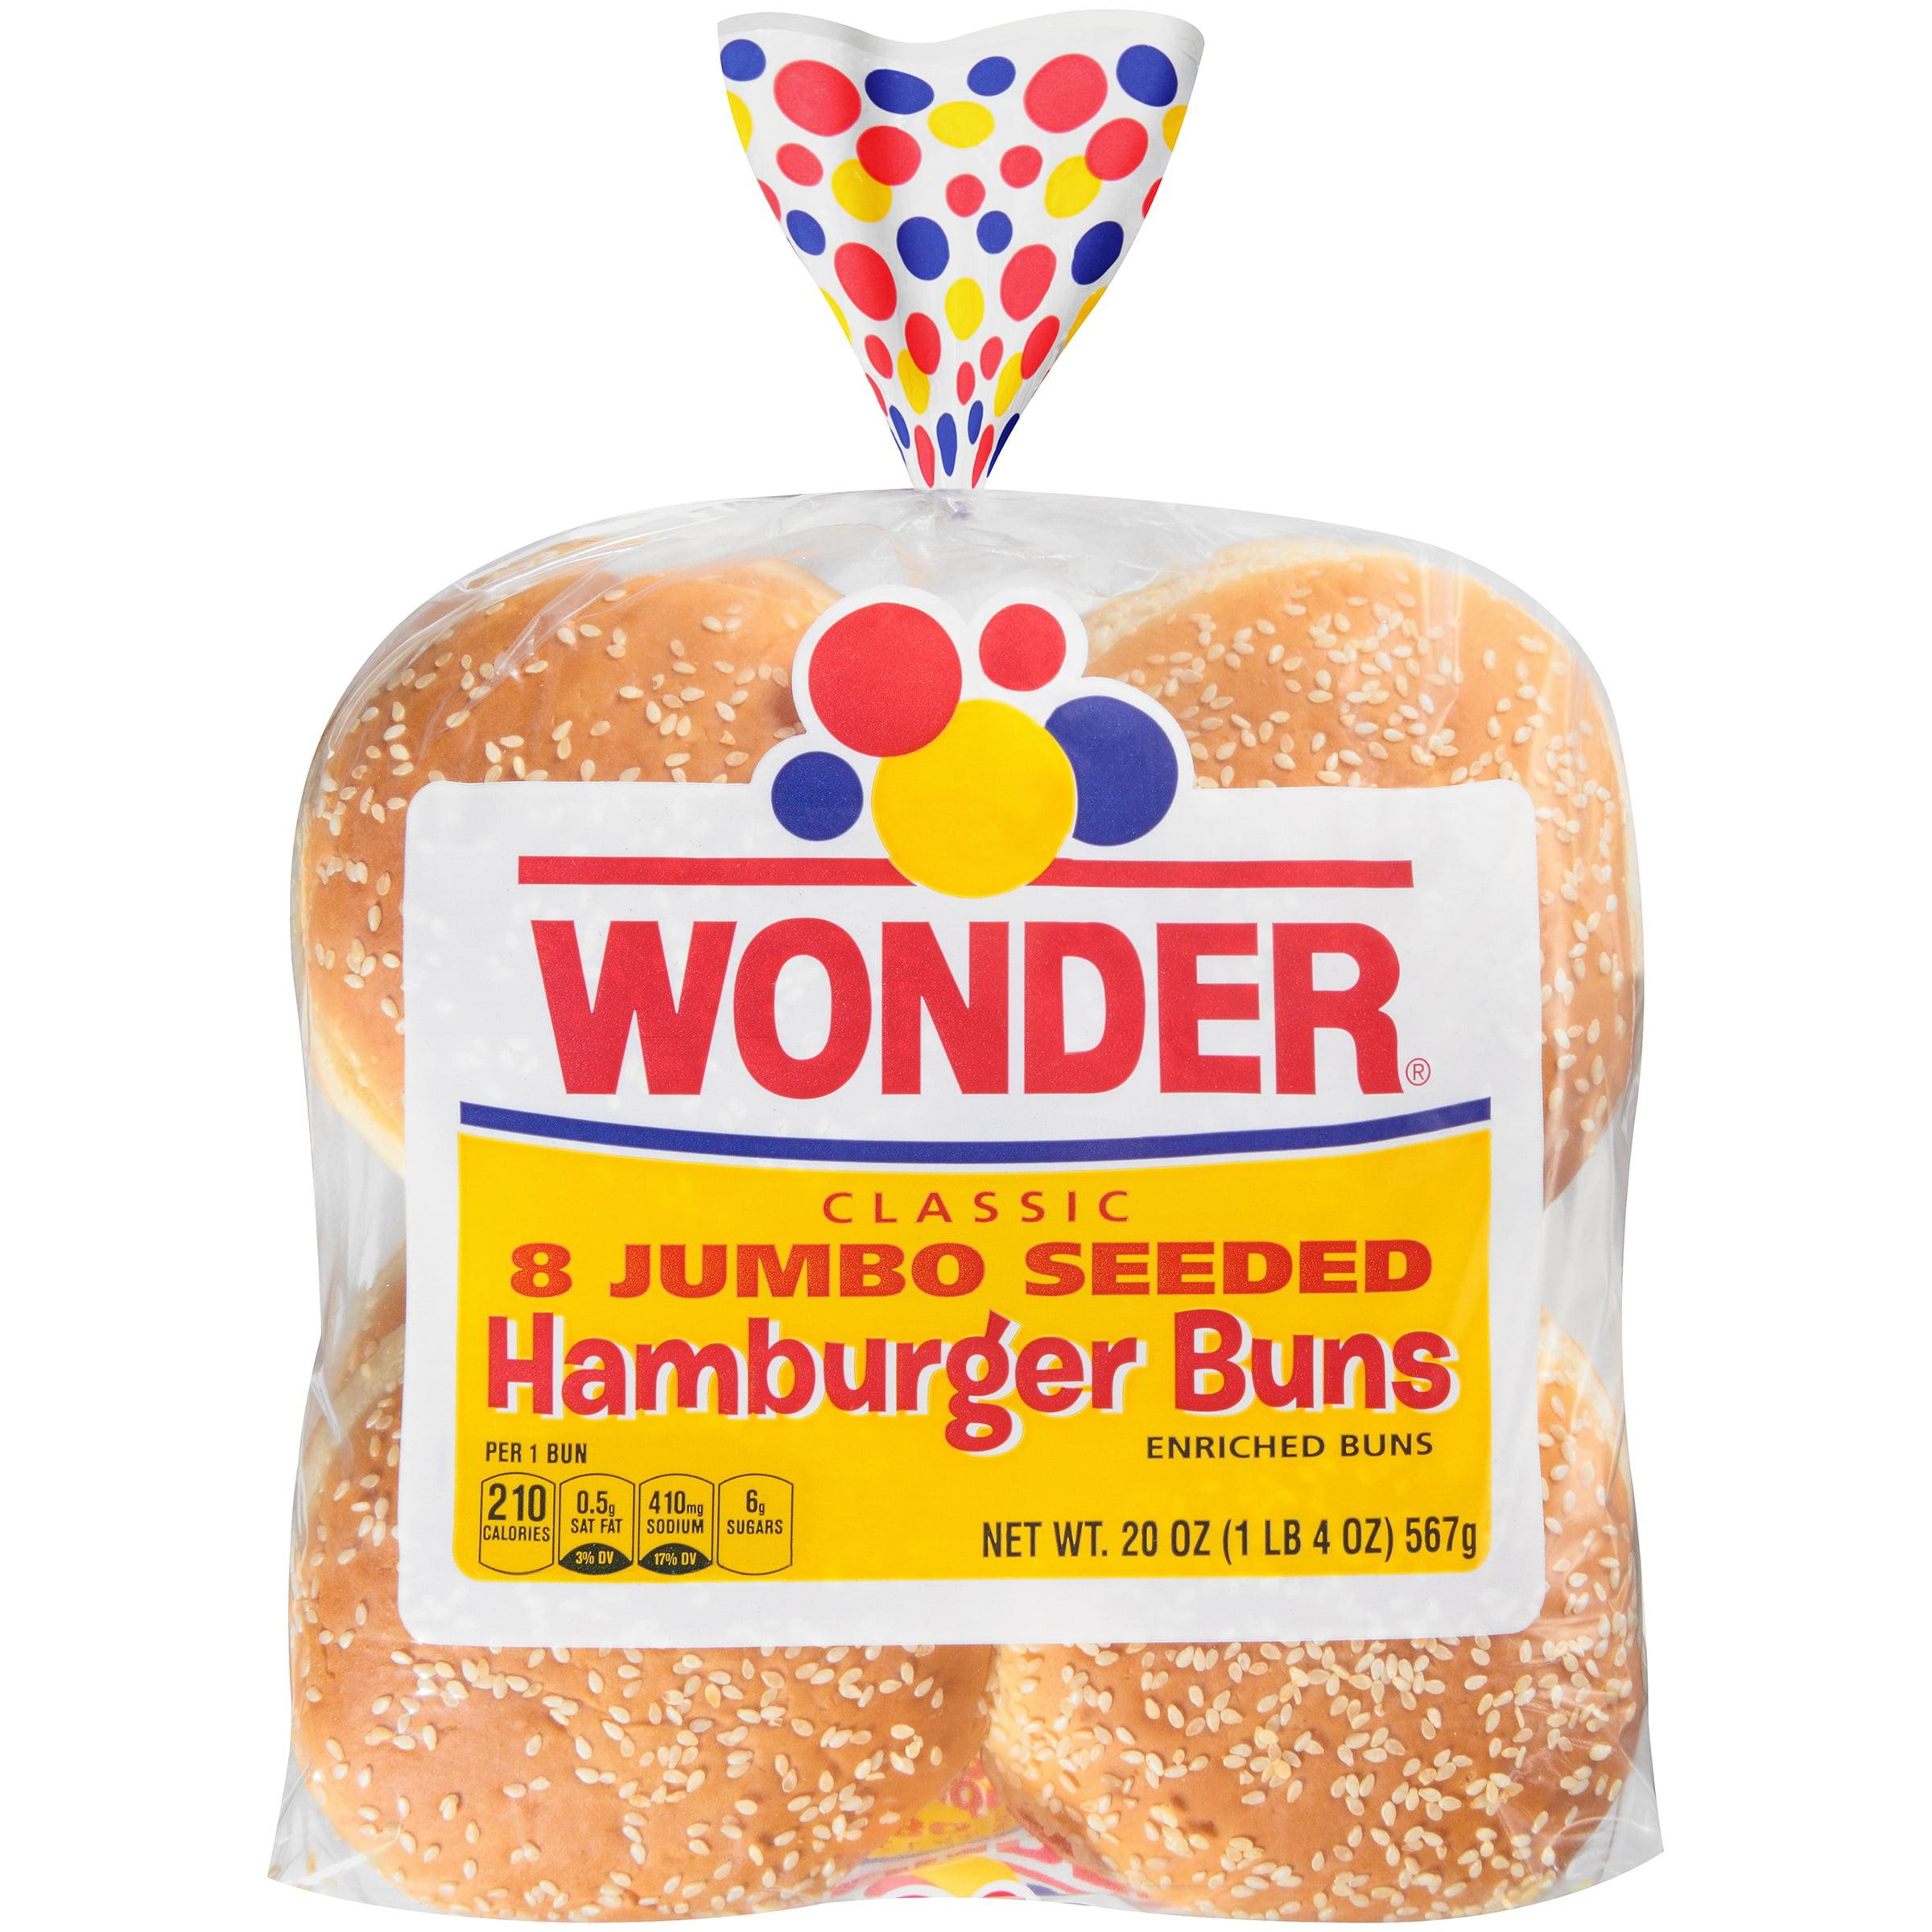 Wonder® Classic Jumbo Seeded Hamburger Buns 20 oz. Bag